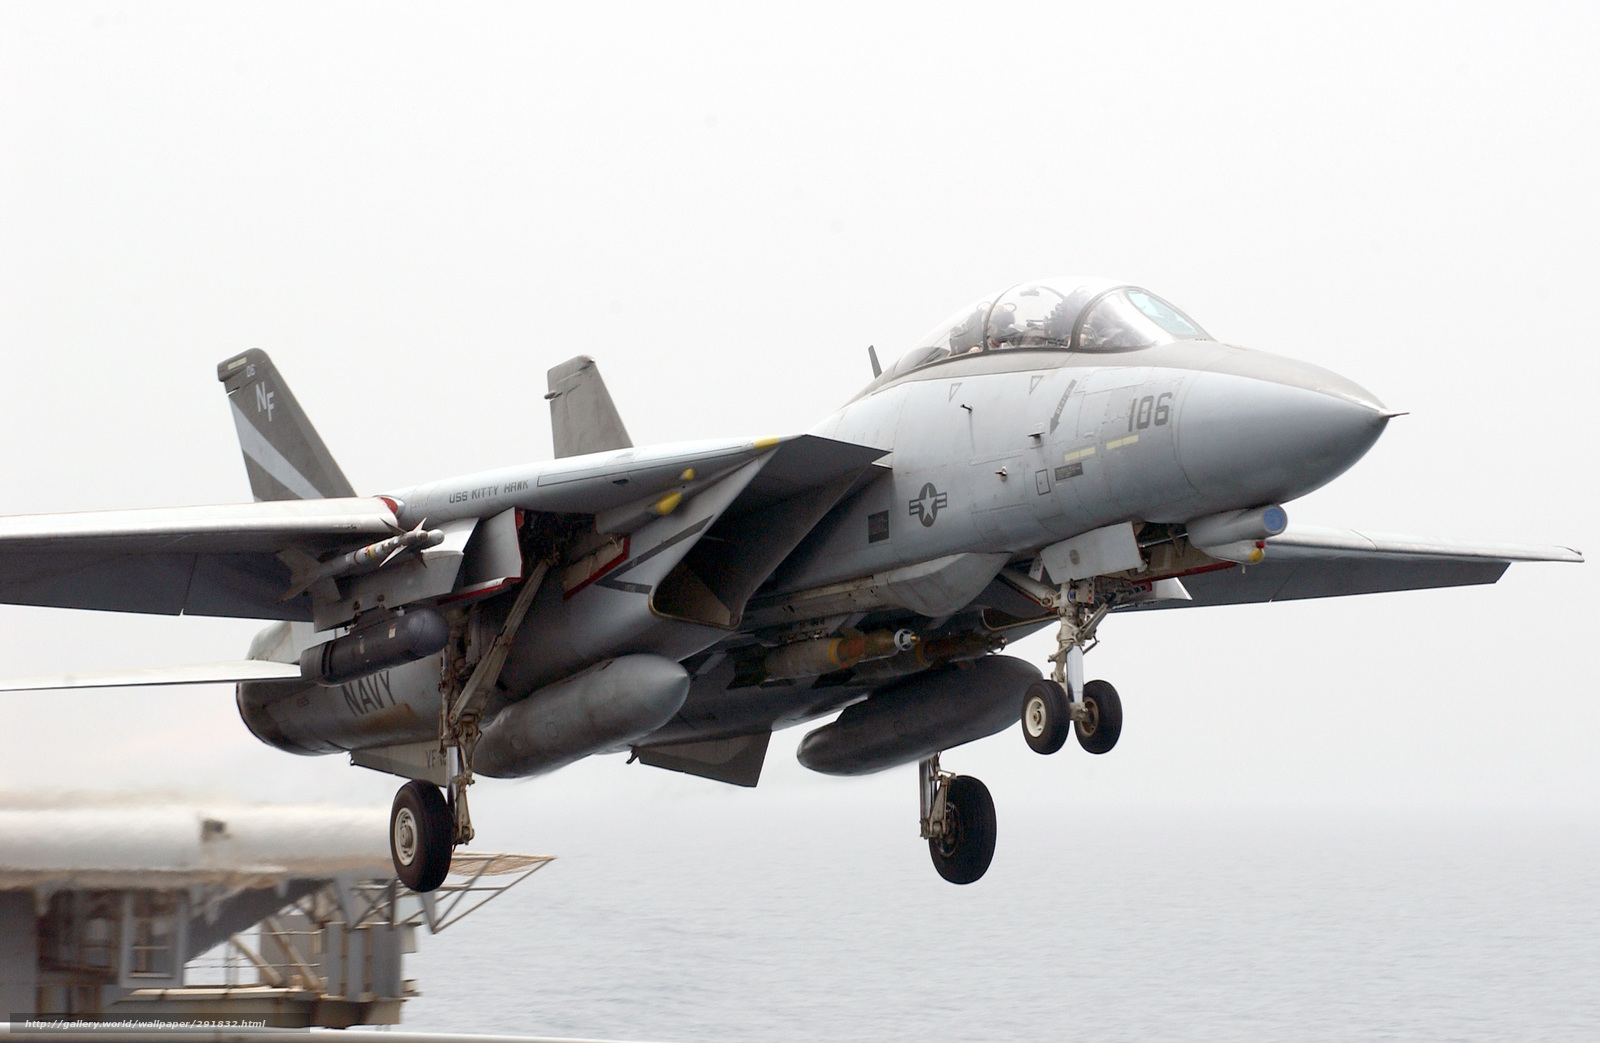 F 14 (戦闘機)の画像 p1_32